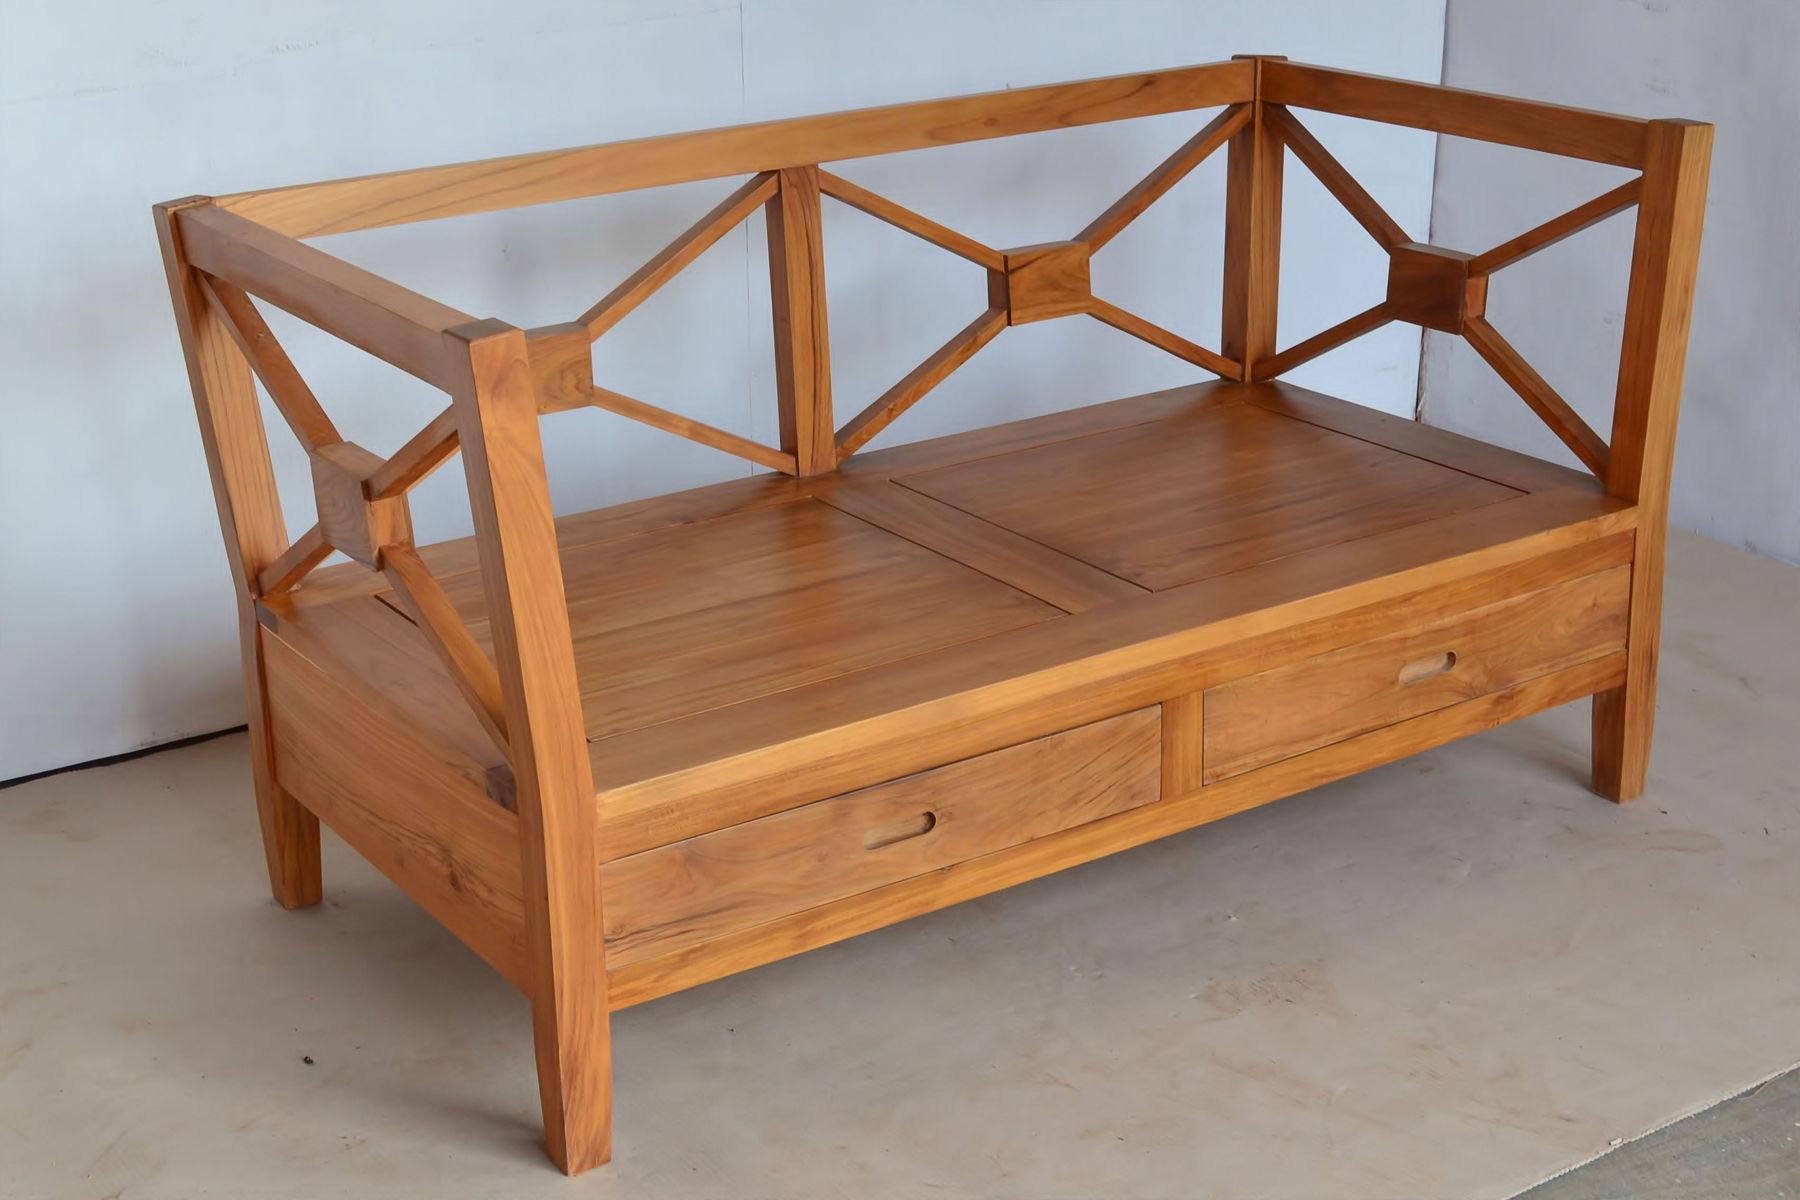 Sofa Minimalis 2 Dudukan Kayu Jati Sandaran Silang